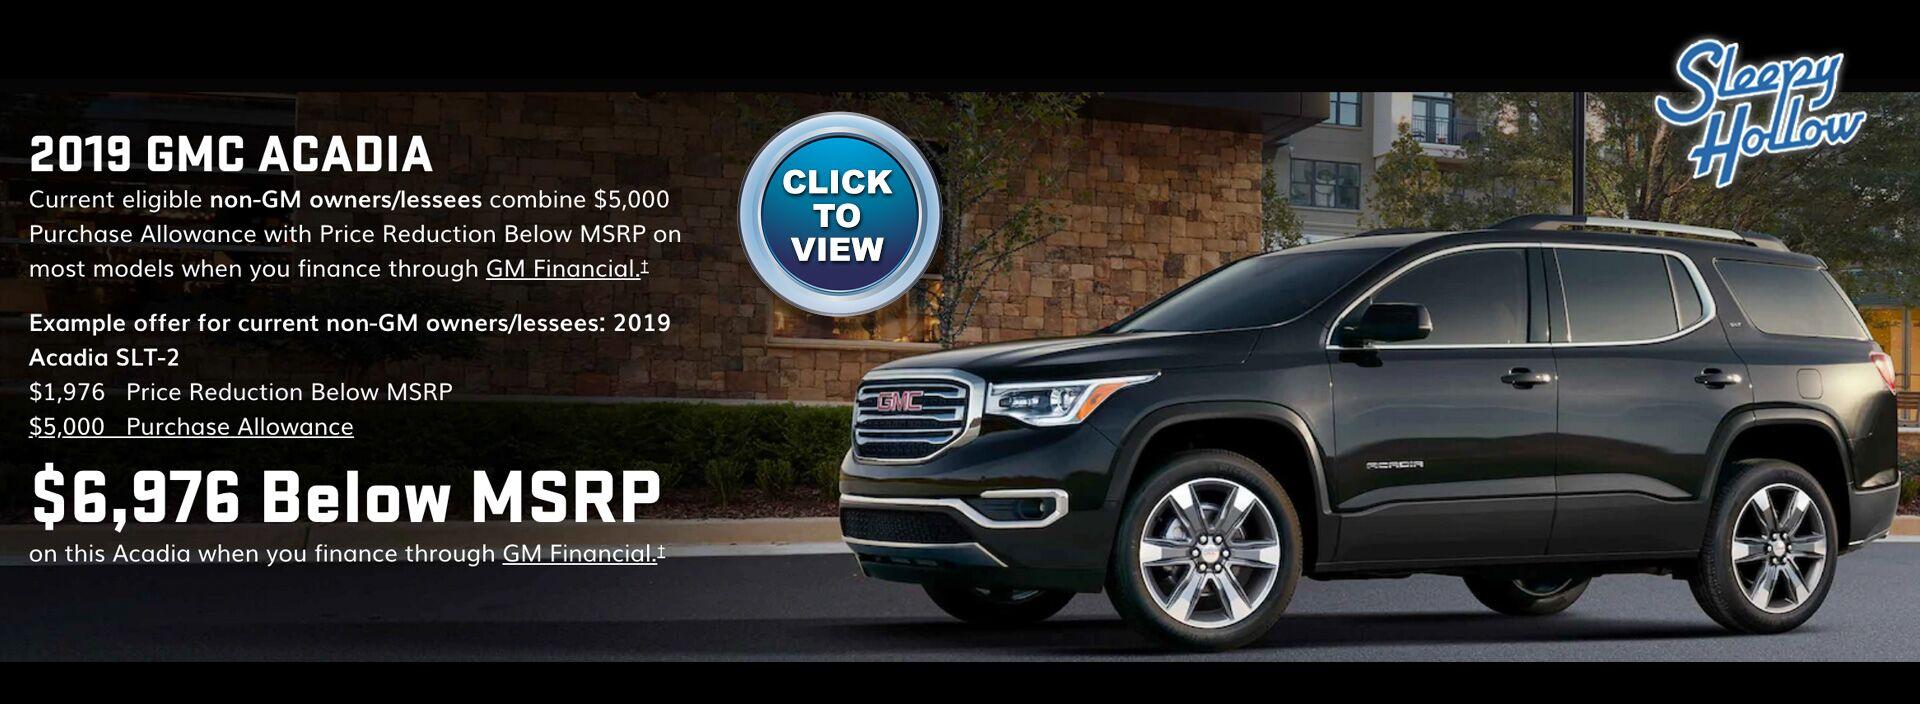 Sleepy Hollow Auto >> Sleepy Hollow Auto New Used Car Truck Dealership In Viroqua Wi